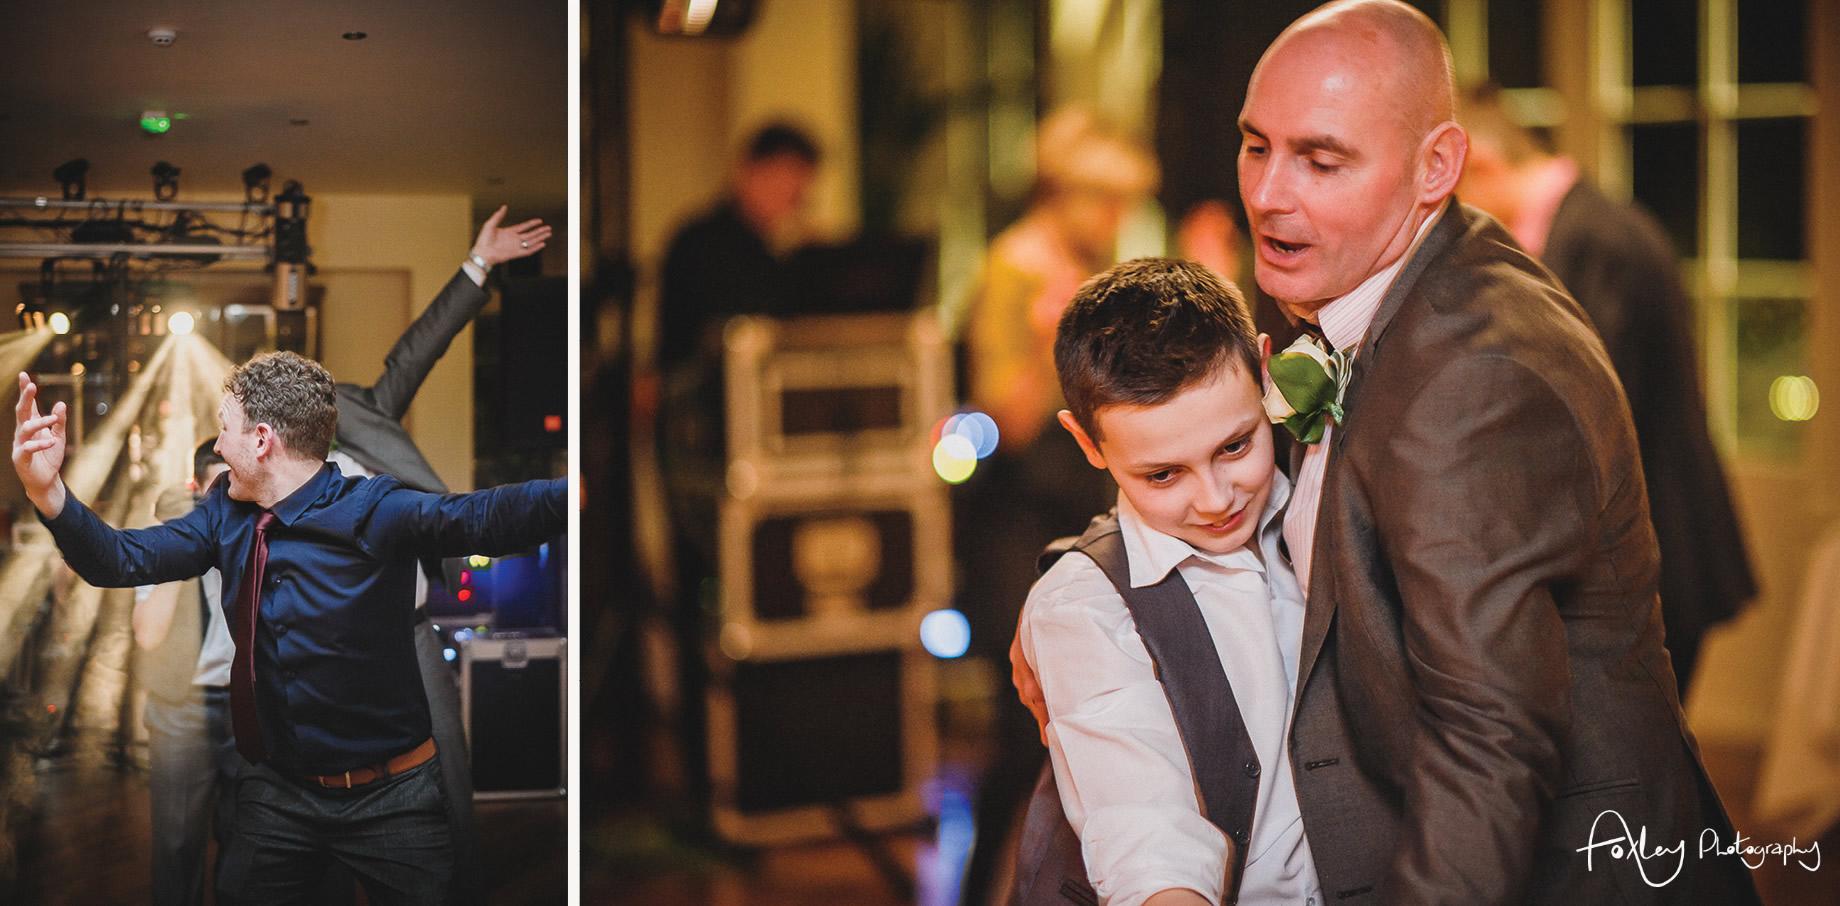 Gemma and Lewis' Wedding at Mitton Hall 176